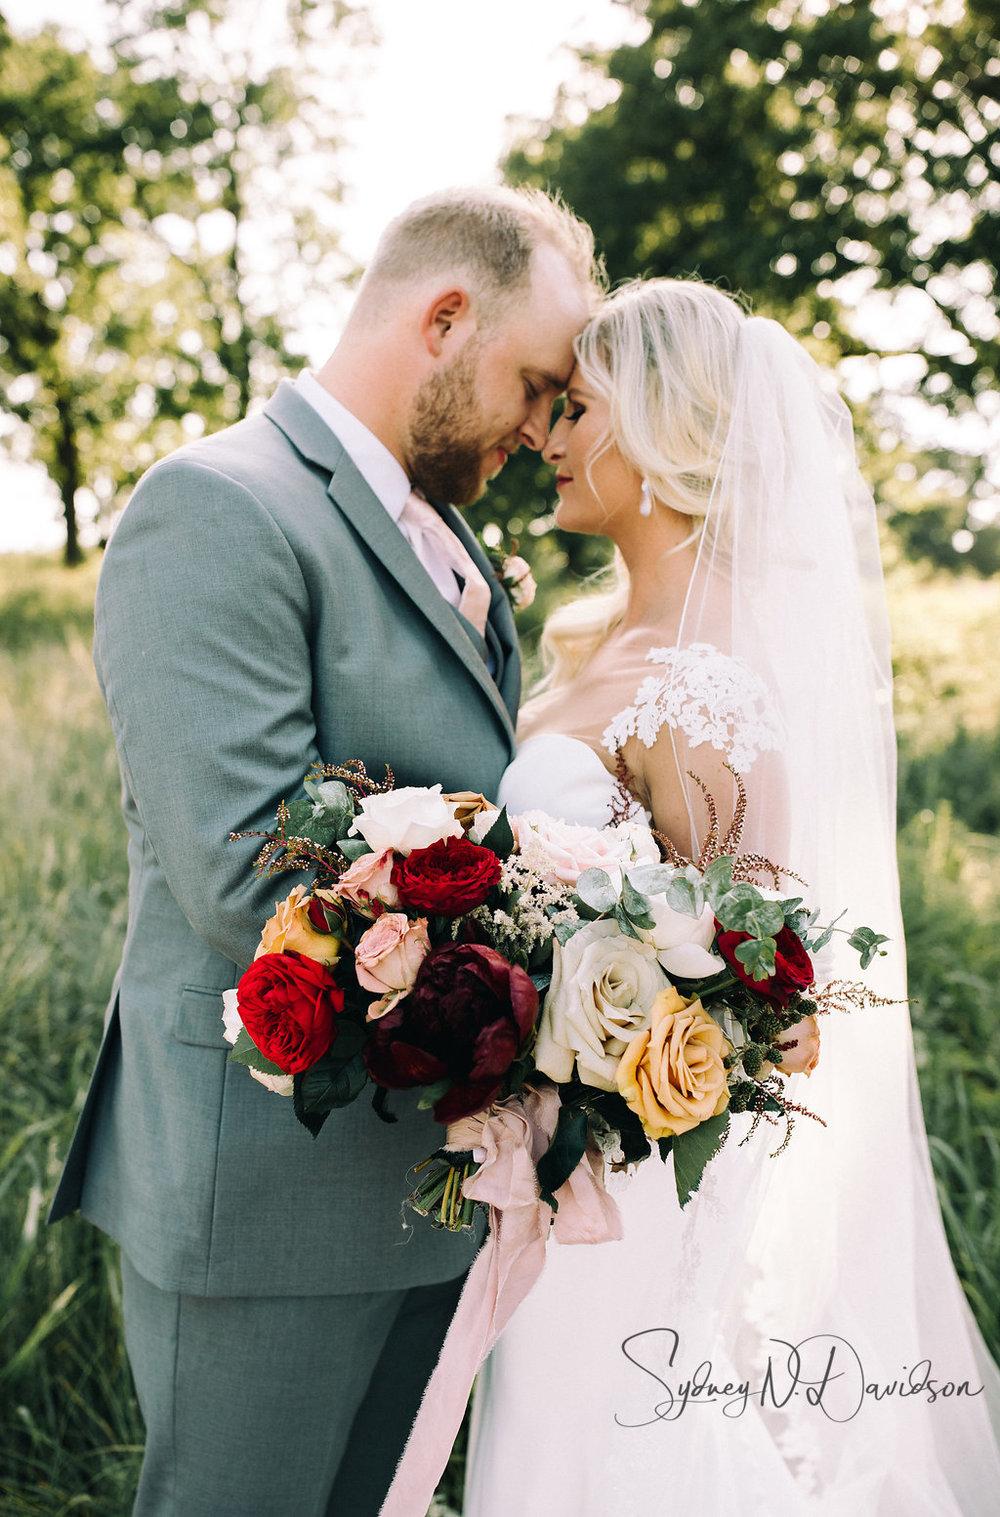 sydney-davidson-wedding-stillwater-oklahoma-wedding-session-traveling-photographer-portrait-tulsa-oklahoma-3427.jpg